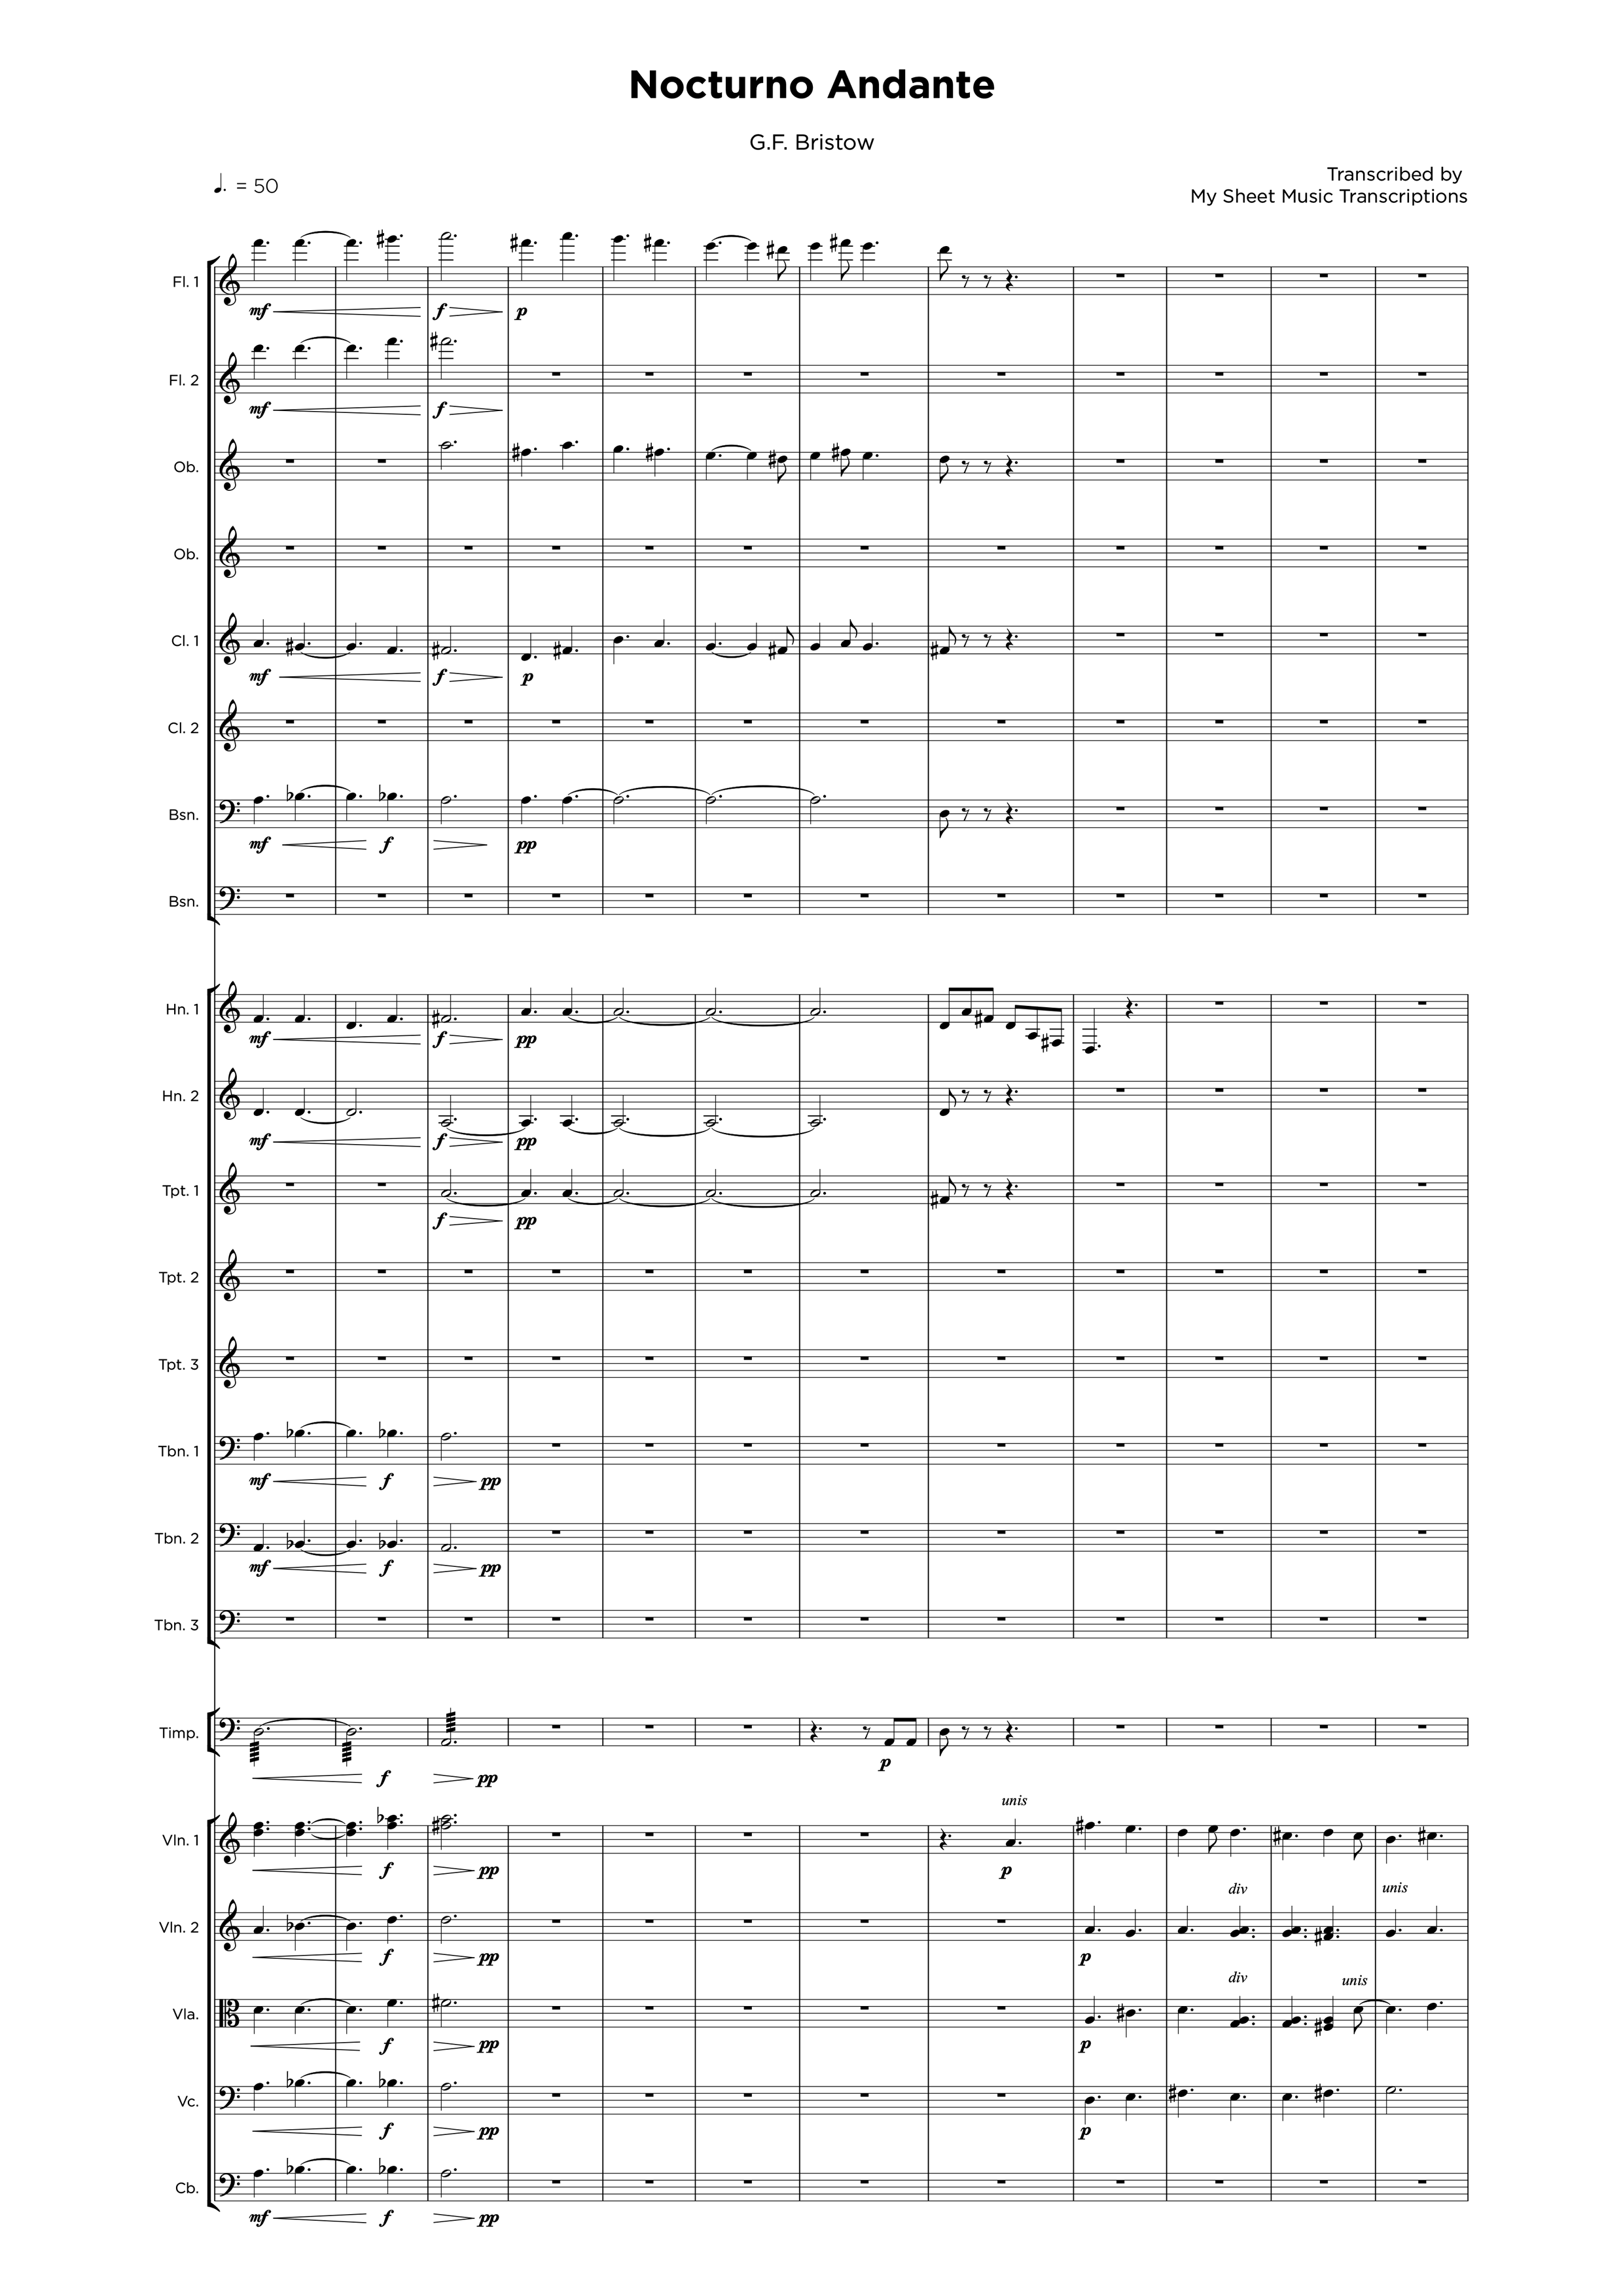 Nocturno Andante - Orchestra sheet music